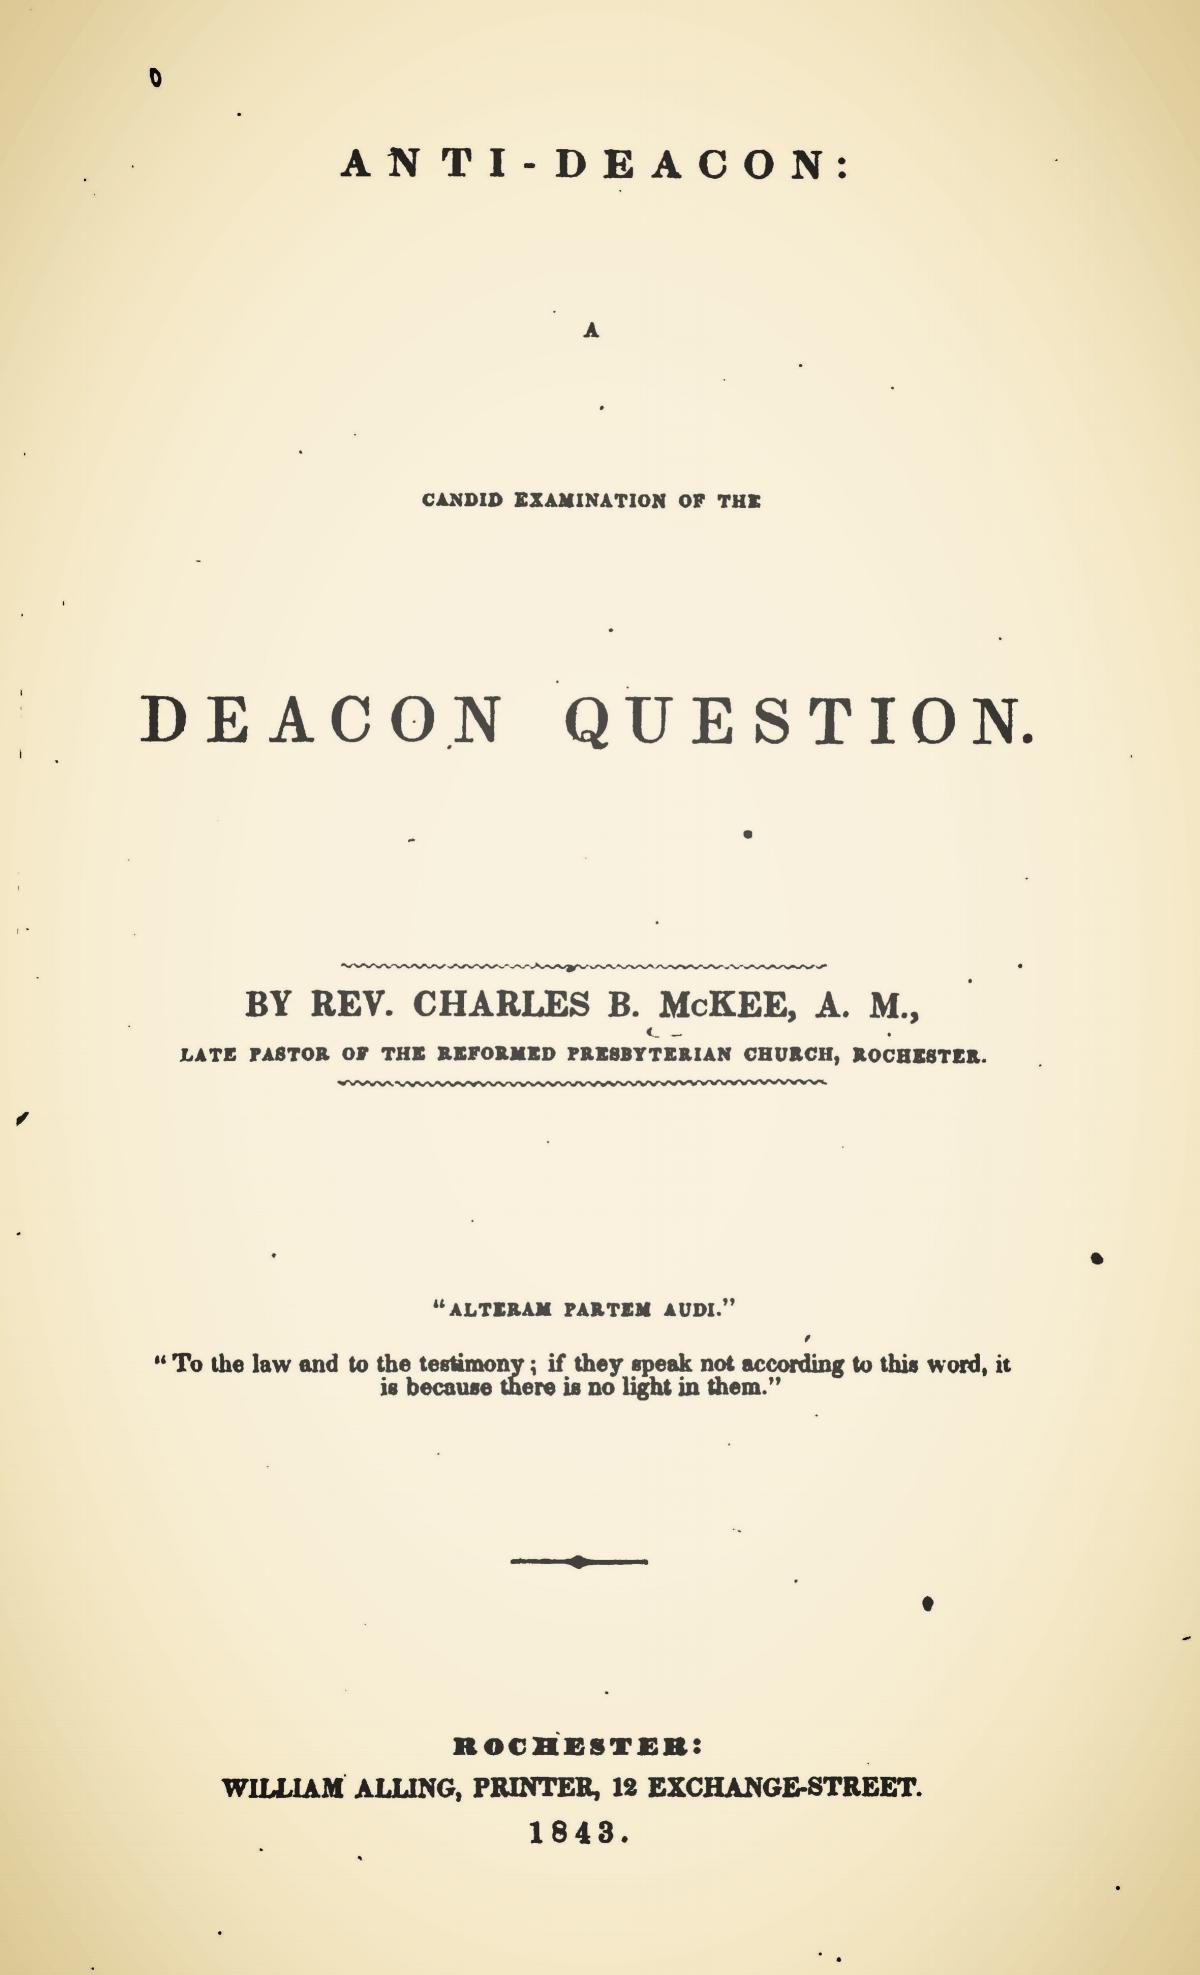 McKee, Charles Brown, Anti-Deacon Title Page.jpg